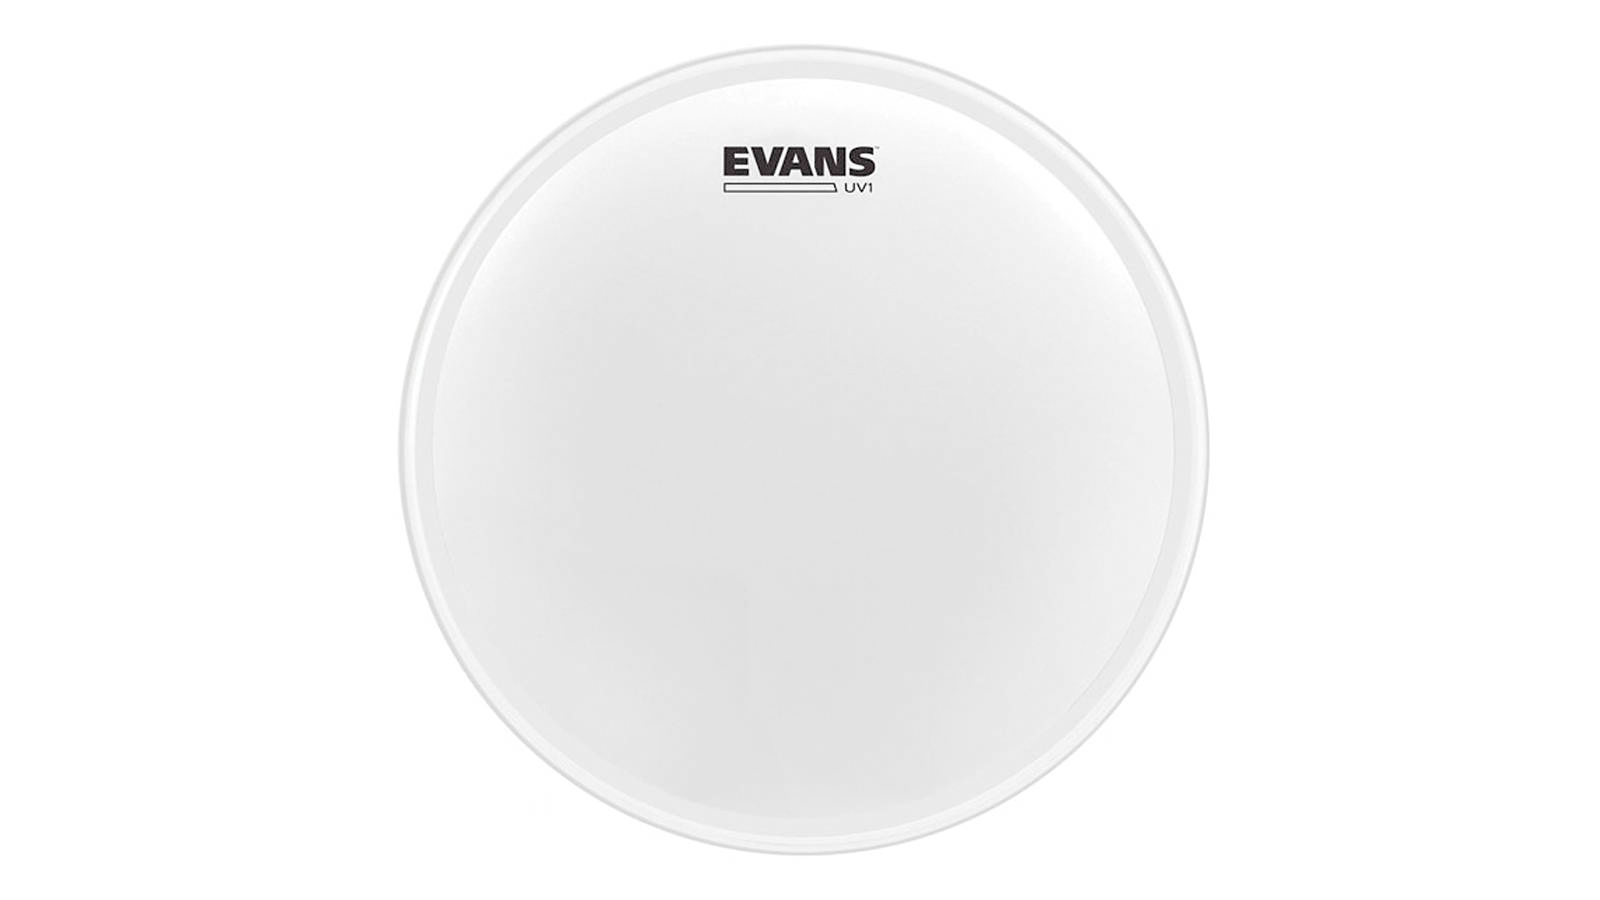 "Evans B10UV1 UV1 Tomfell Coated 10"""